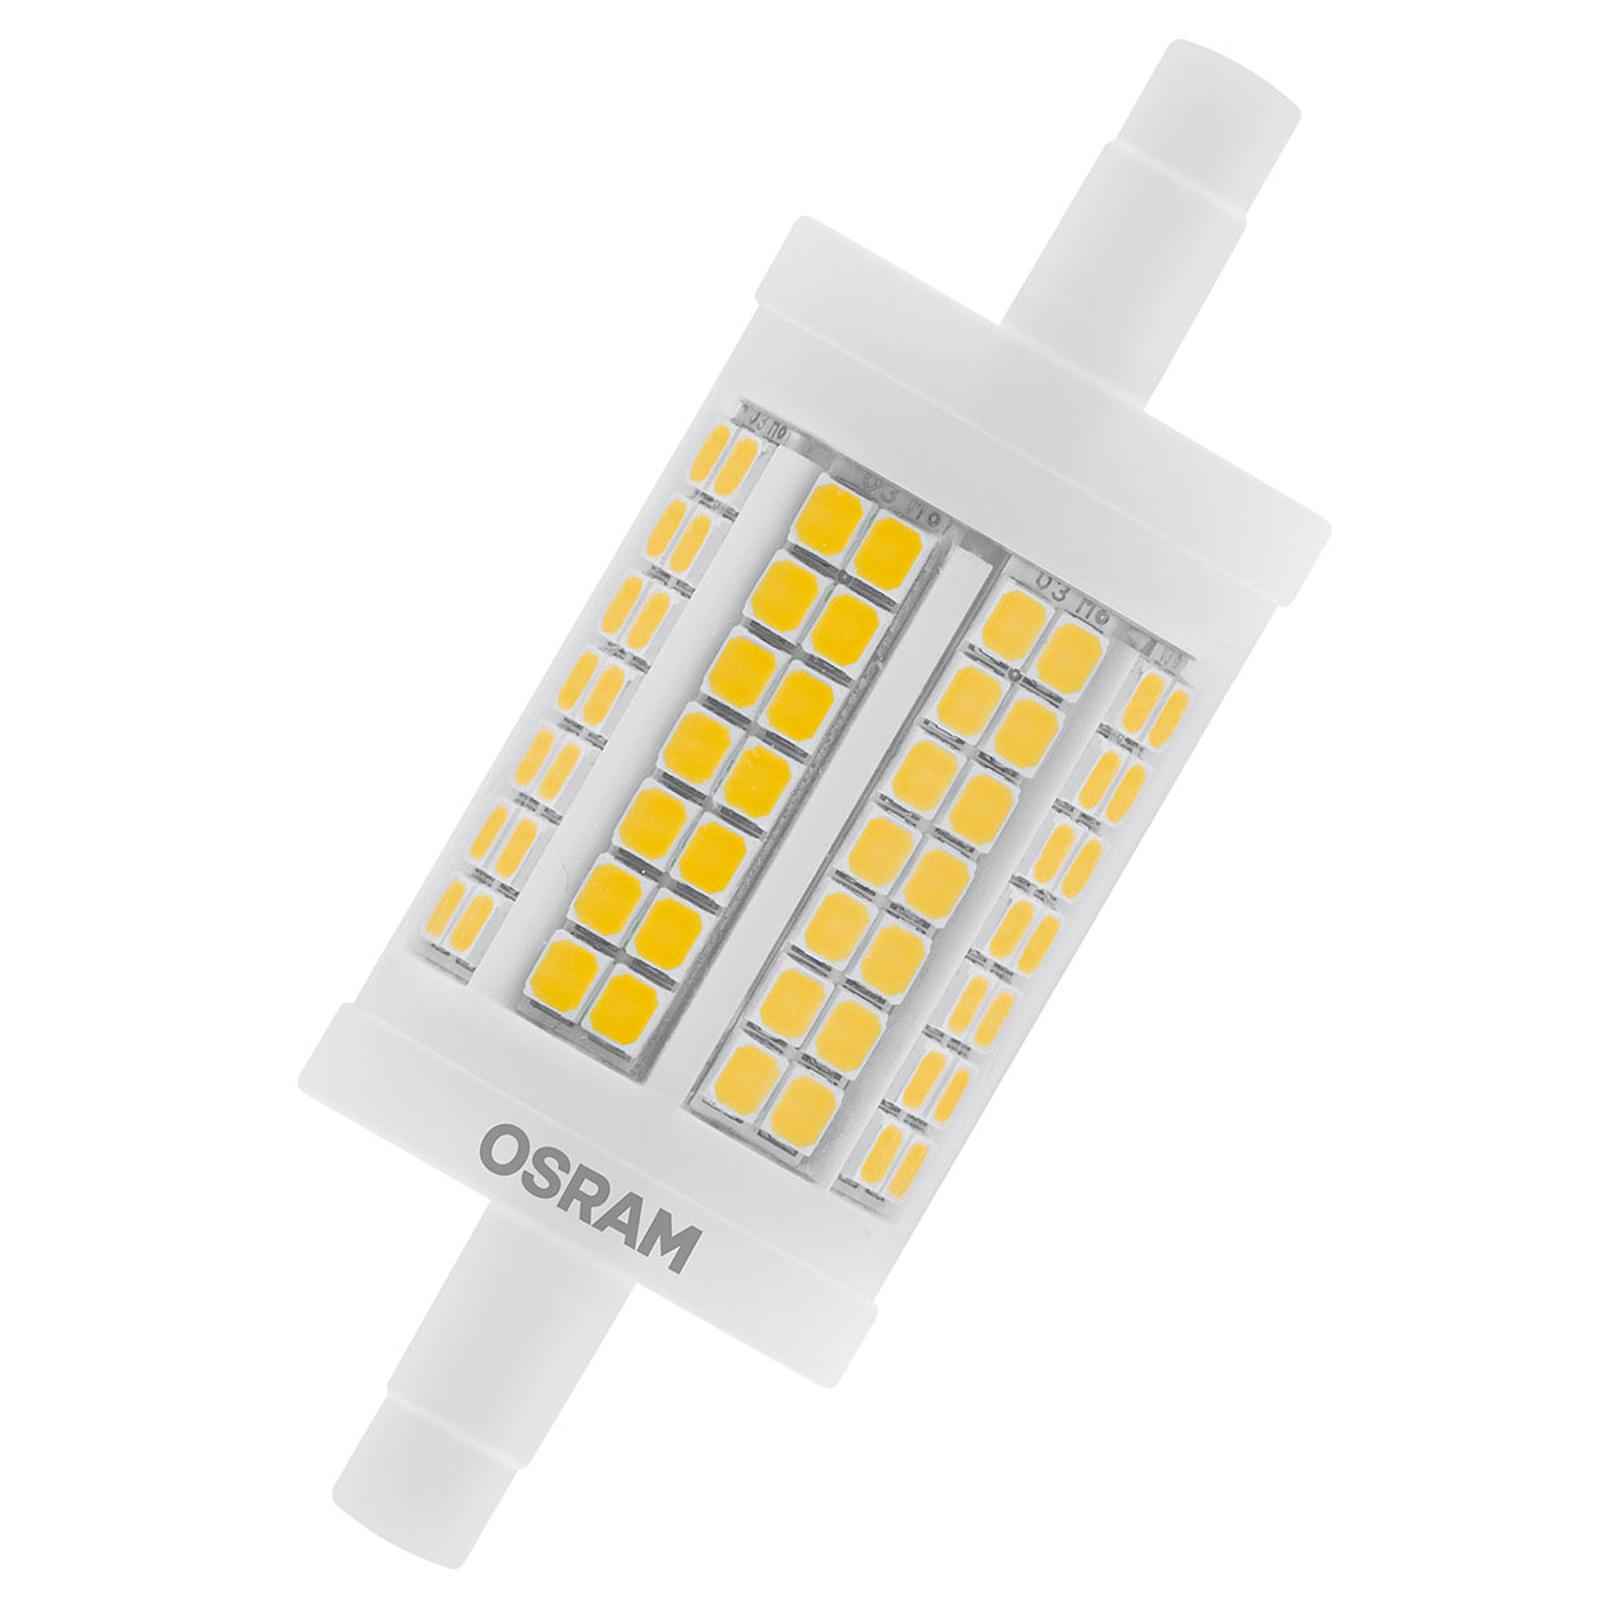 OSRAM LED-stav R7s 11,5W 7,8 cm 827 dimbar